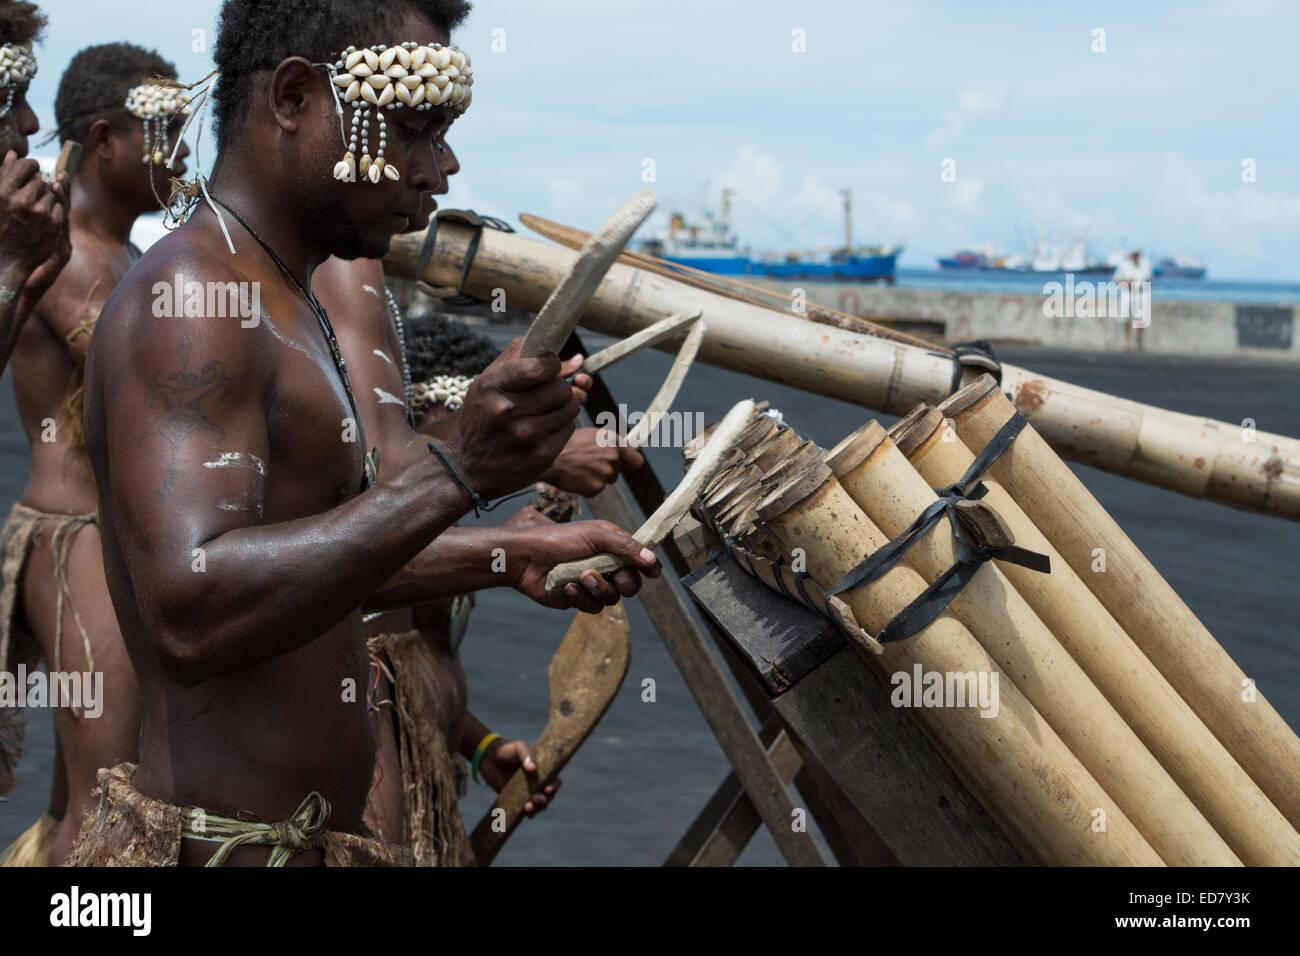 Melanesia, Solomon Islands, Guadalcanal Island, capital city of Honiara. Village welcome band. - Stock Image